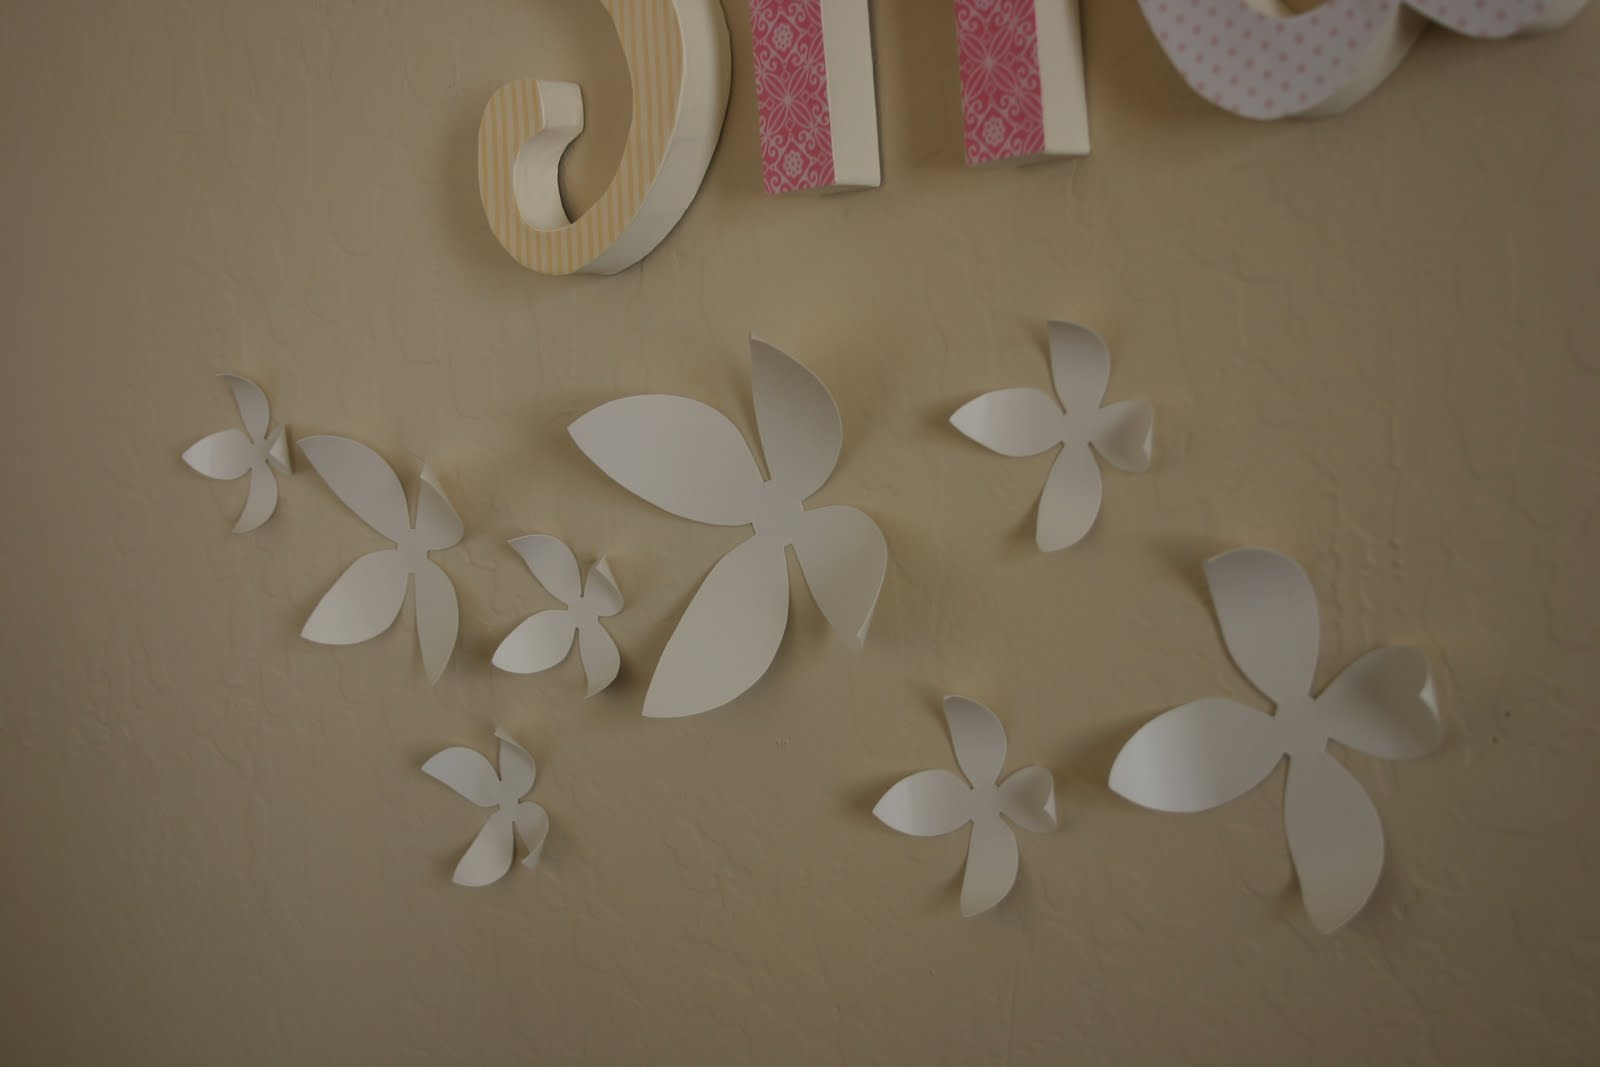 Honeybee Vintage DIY Wall Flowers for 25 Cents